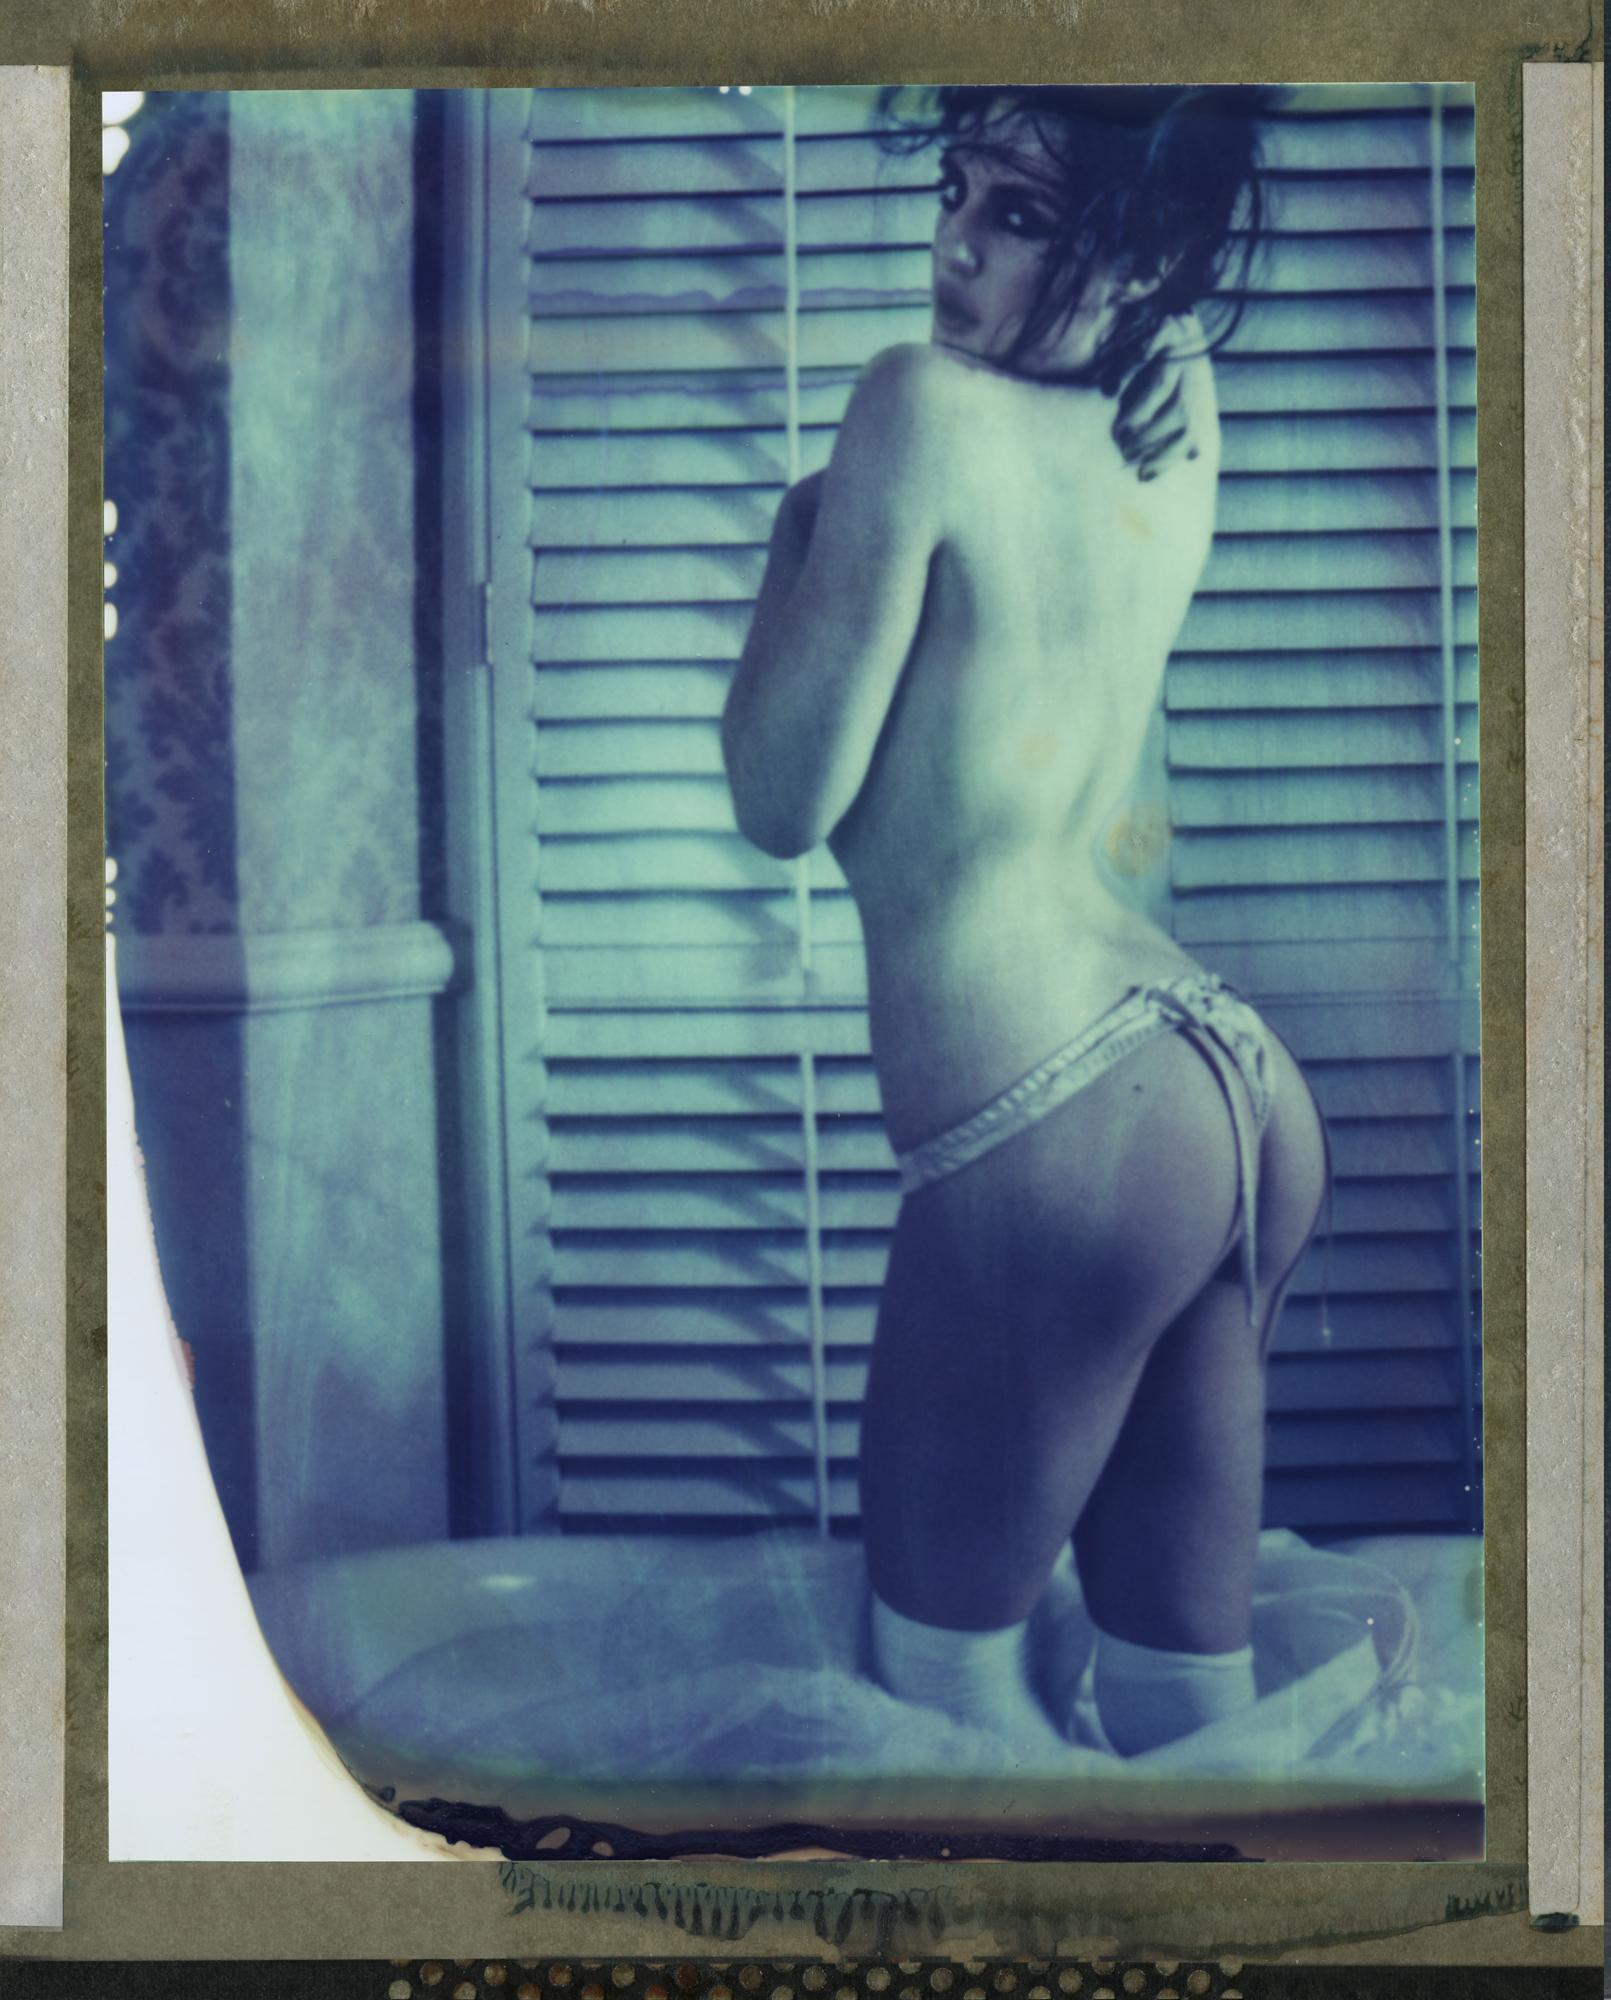 Untitled - Contemporary, 21st Century, Polaroid, Figurative, Nude